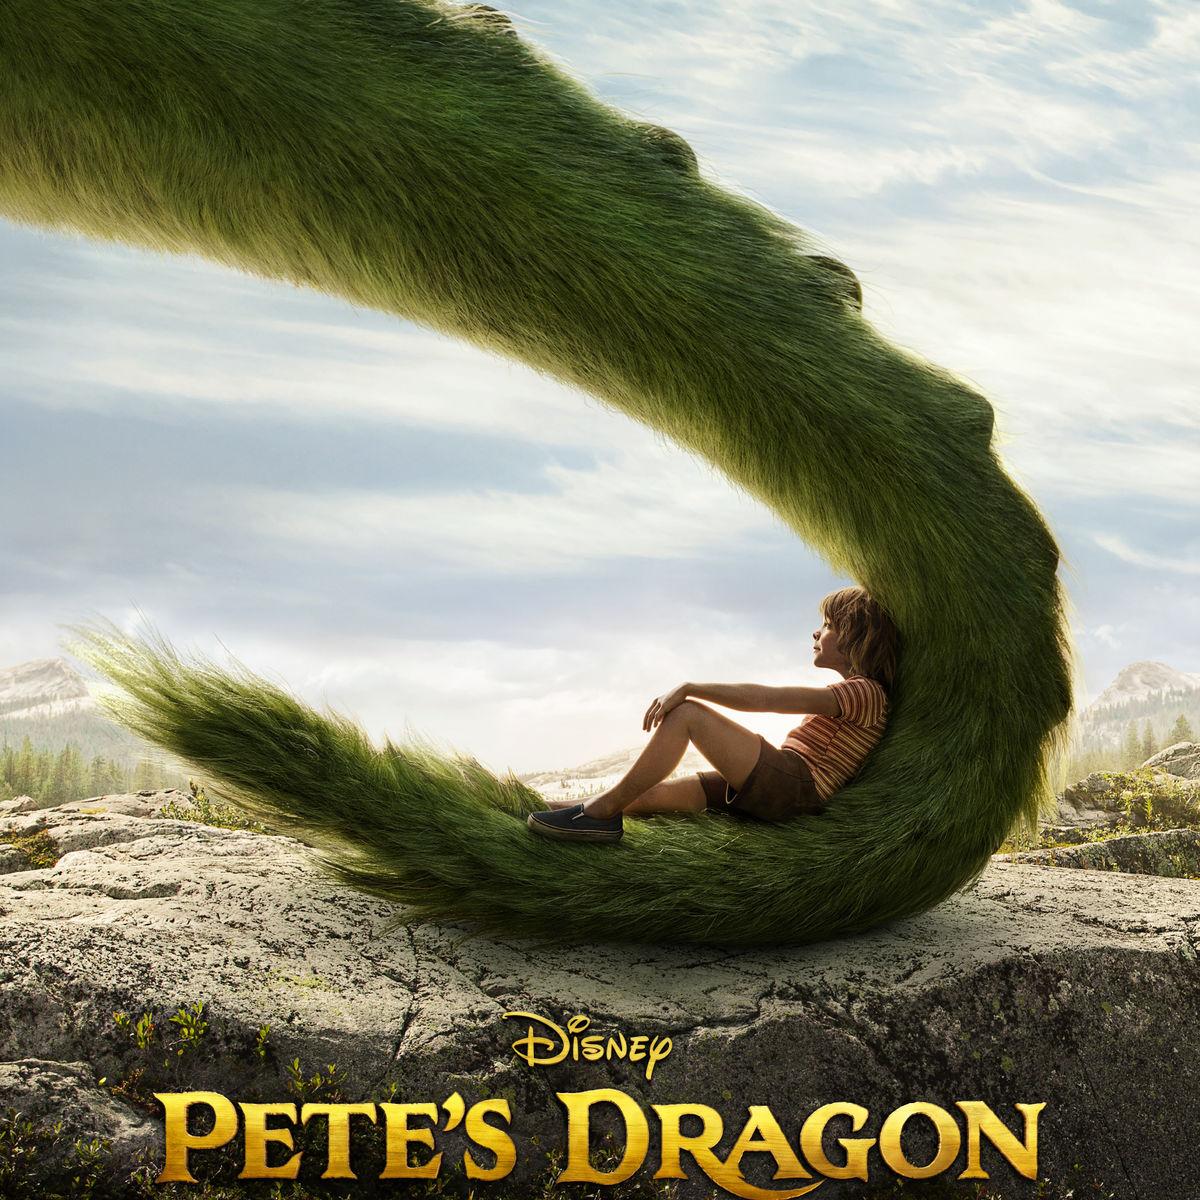 Petes-Dragon-poster.jpg